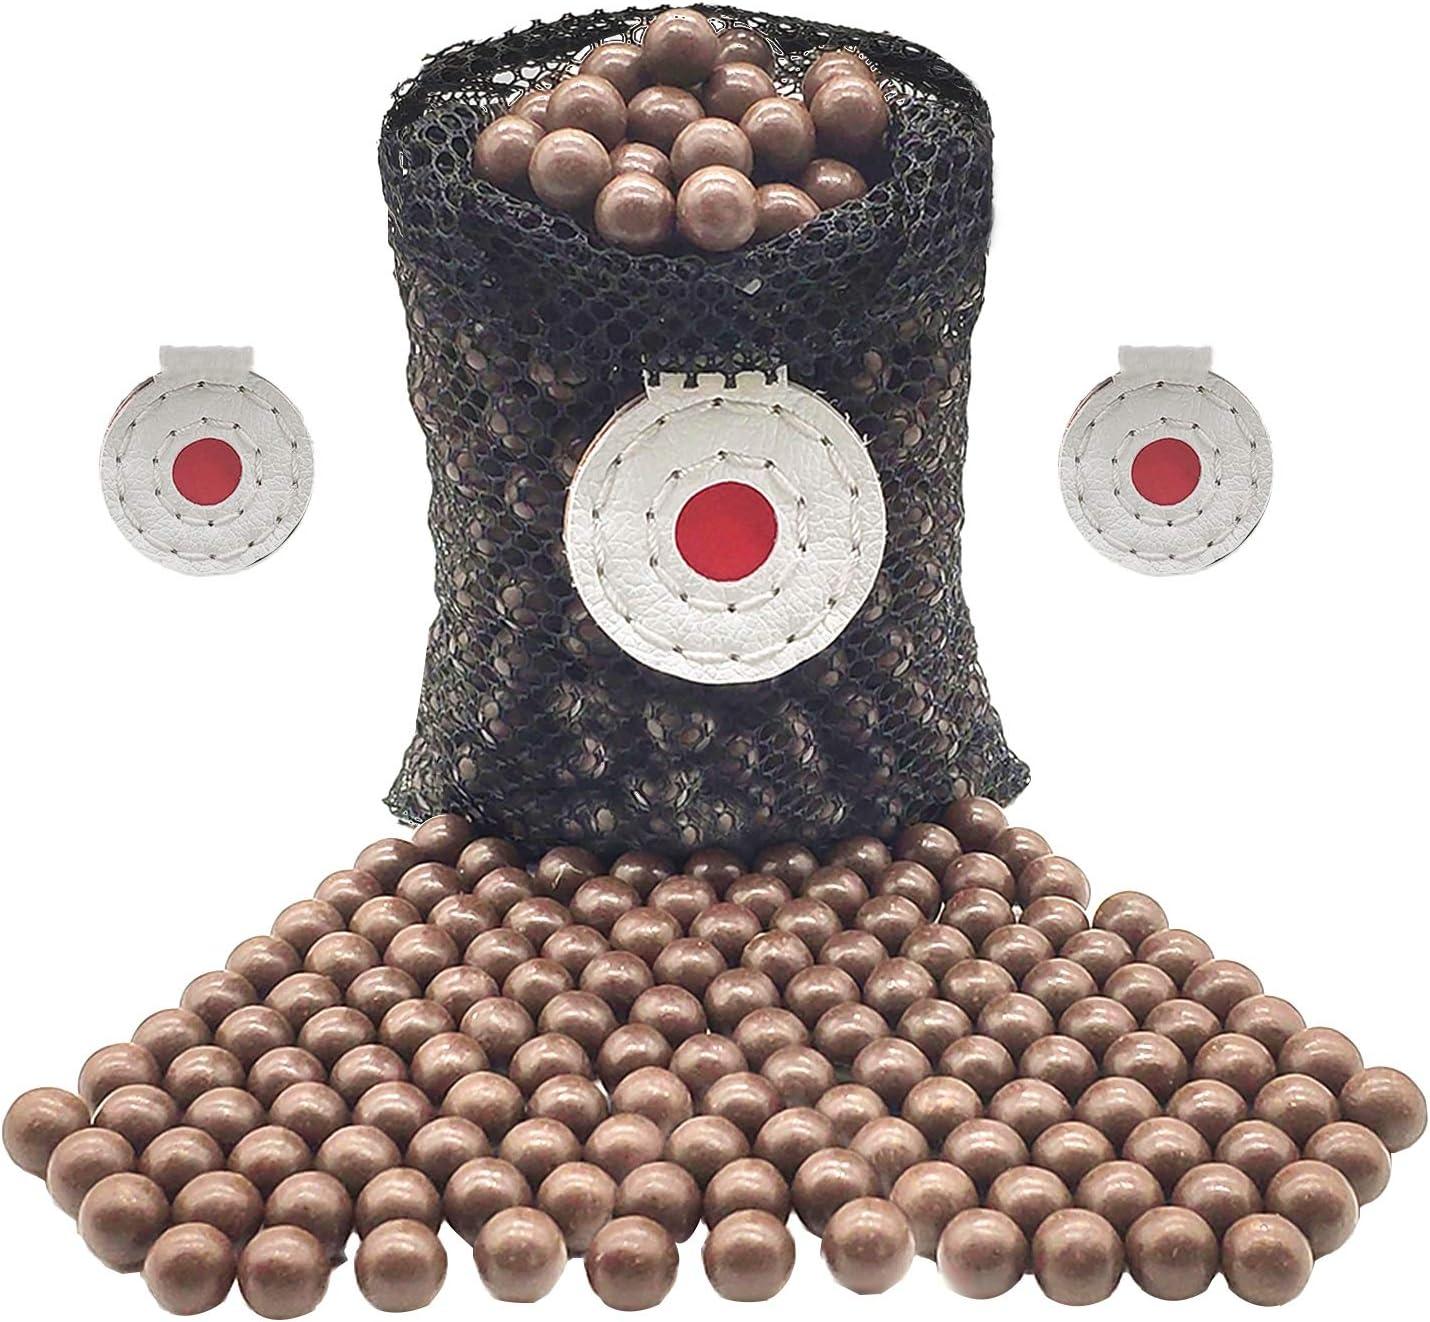 300 Pcs Recommendation Slingshot Ammo Seasonal Wrap Introduction 10mm Balls Hard Clay Bio